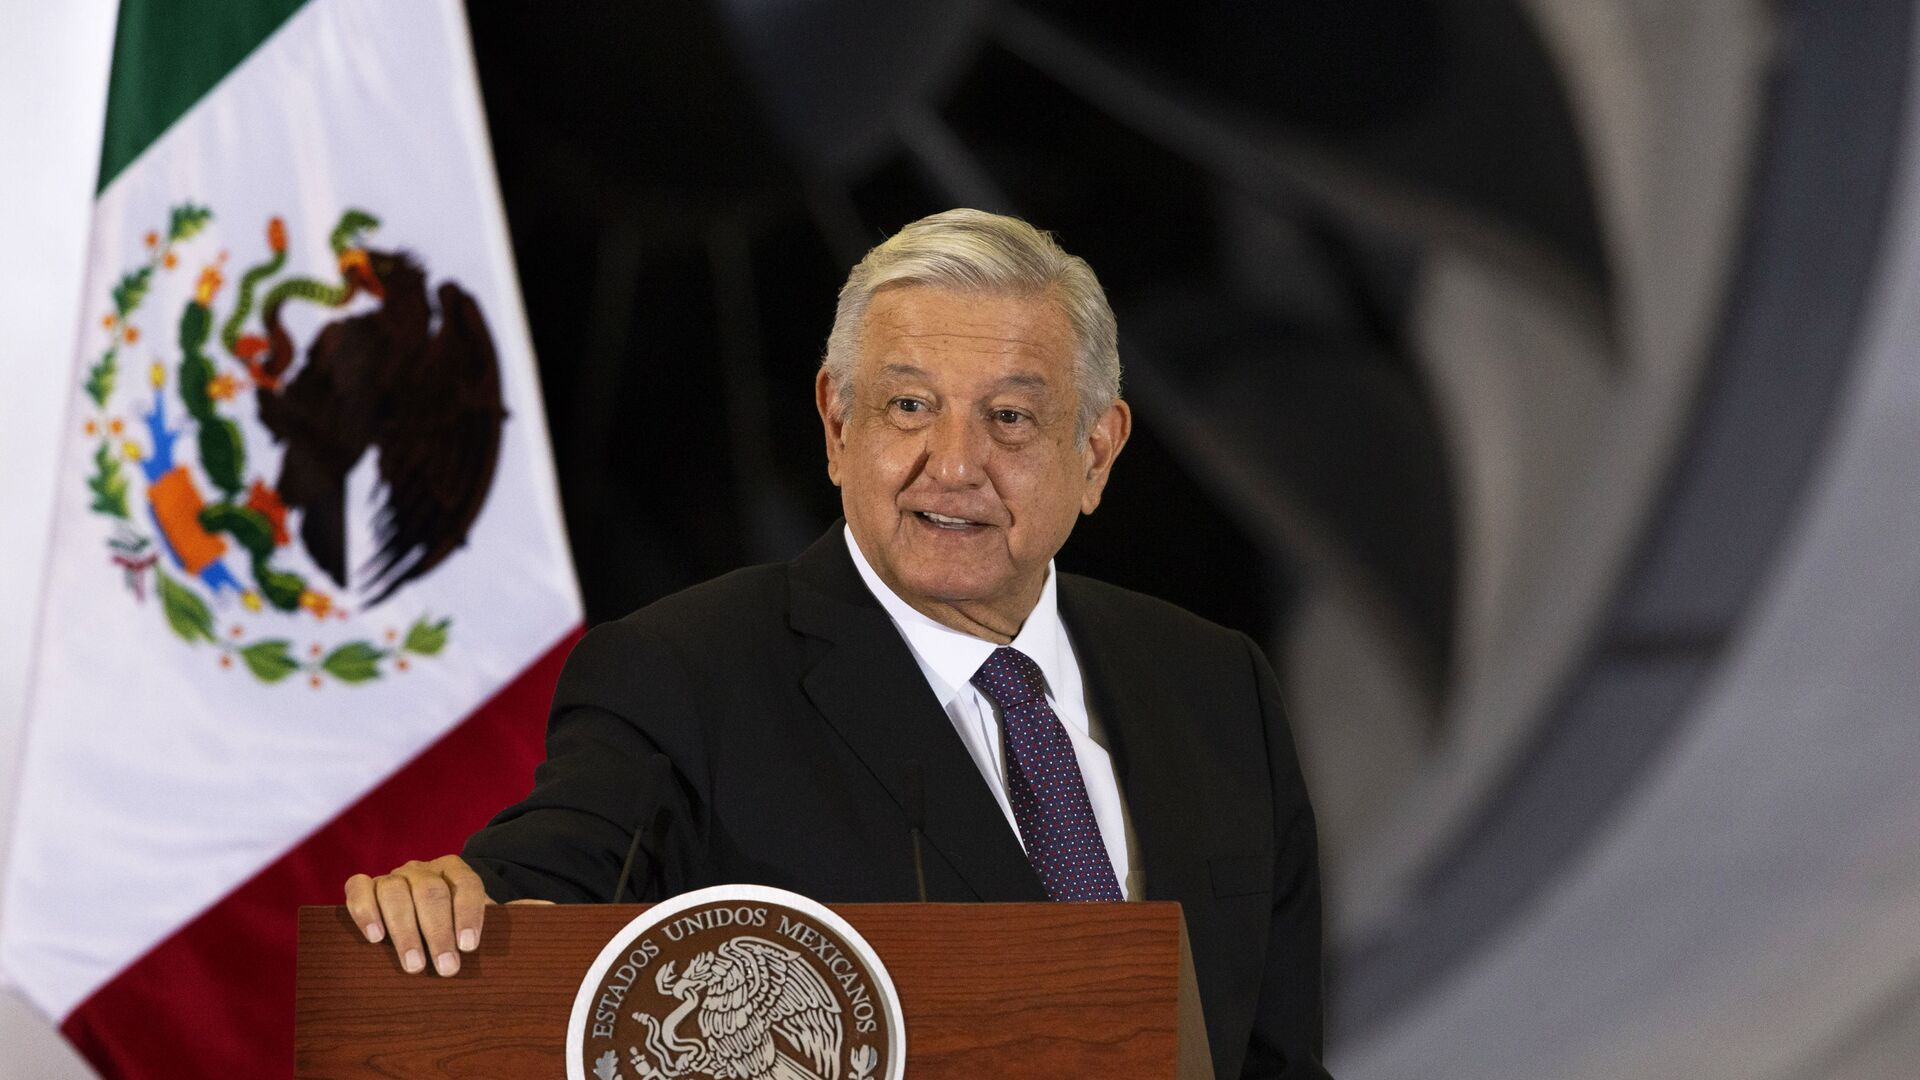 El presidente de México, Andrés Manuel López Obrador - Sputnik Mundo, 1920, 16.04.2021